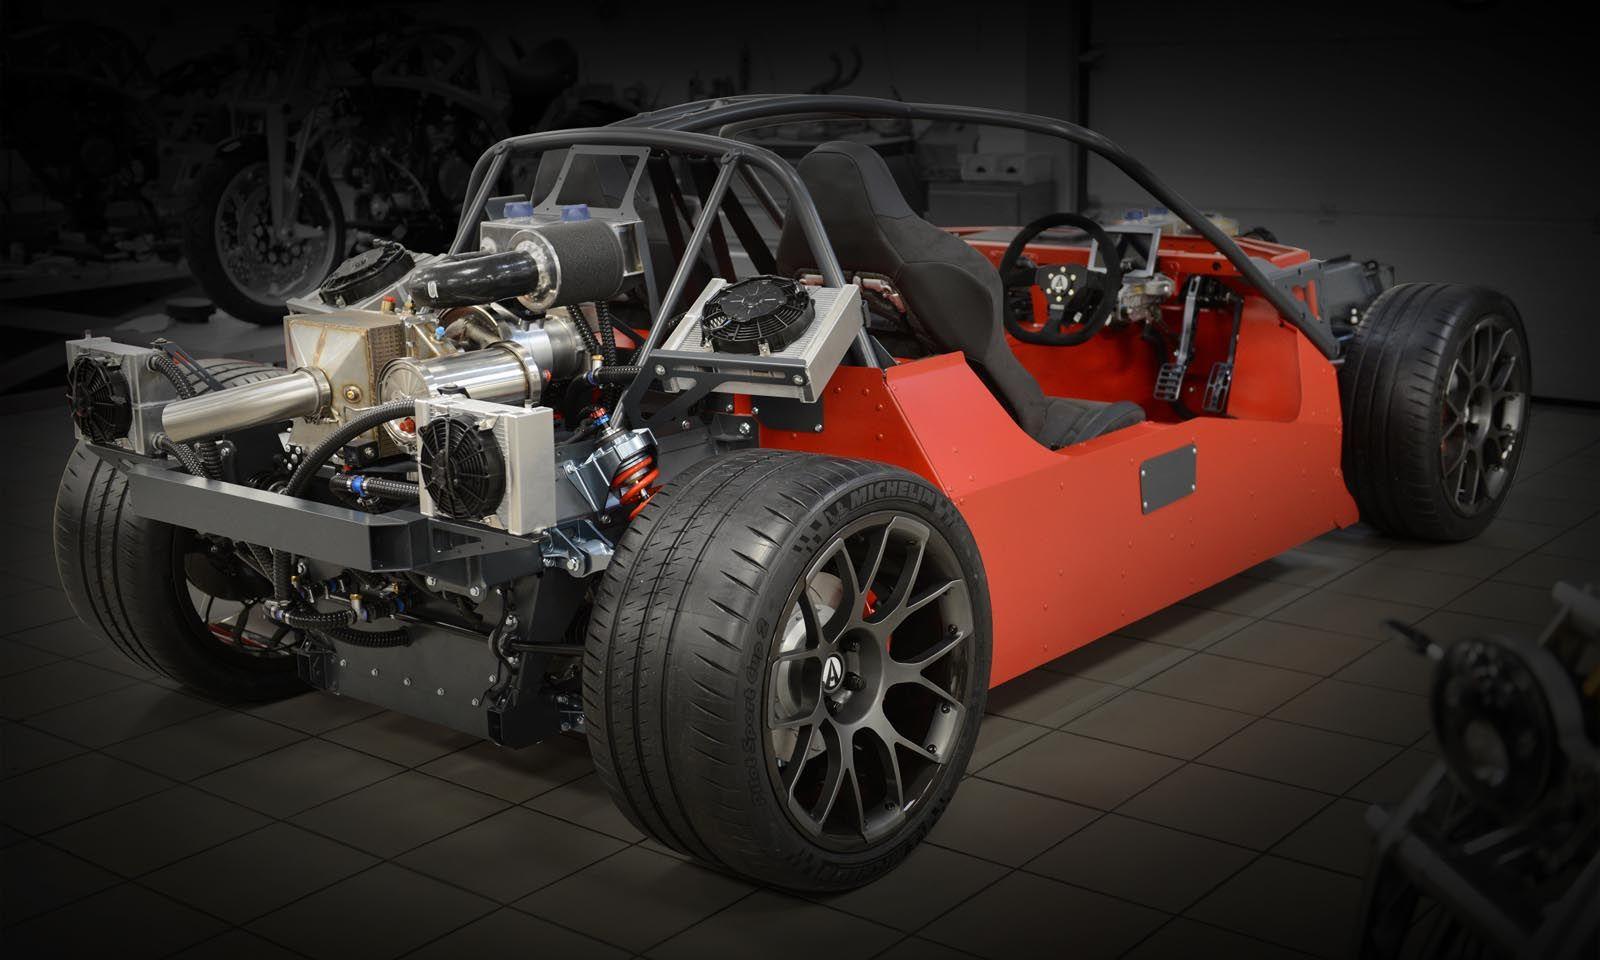 Ariel Previews Its 1 180 Hp Electric Supercar Supercar Design Electric Sports Car Diy Electric Car